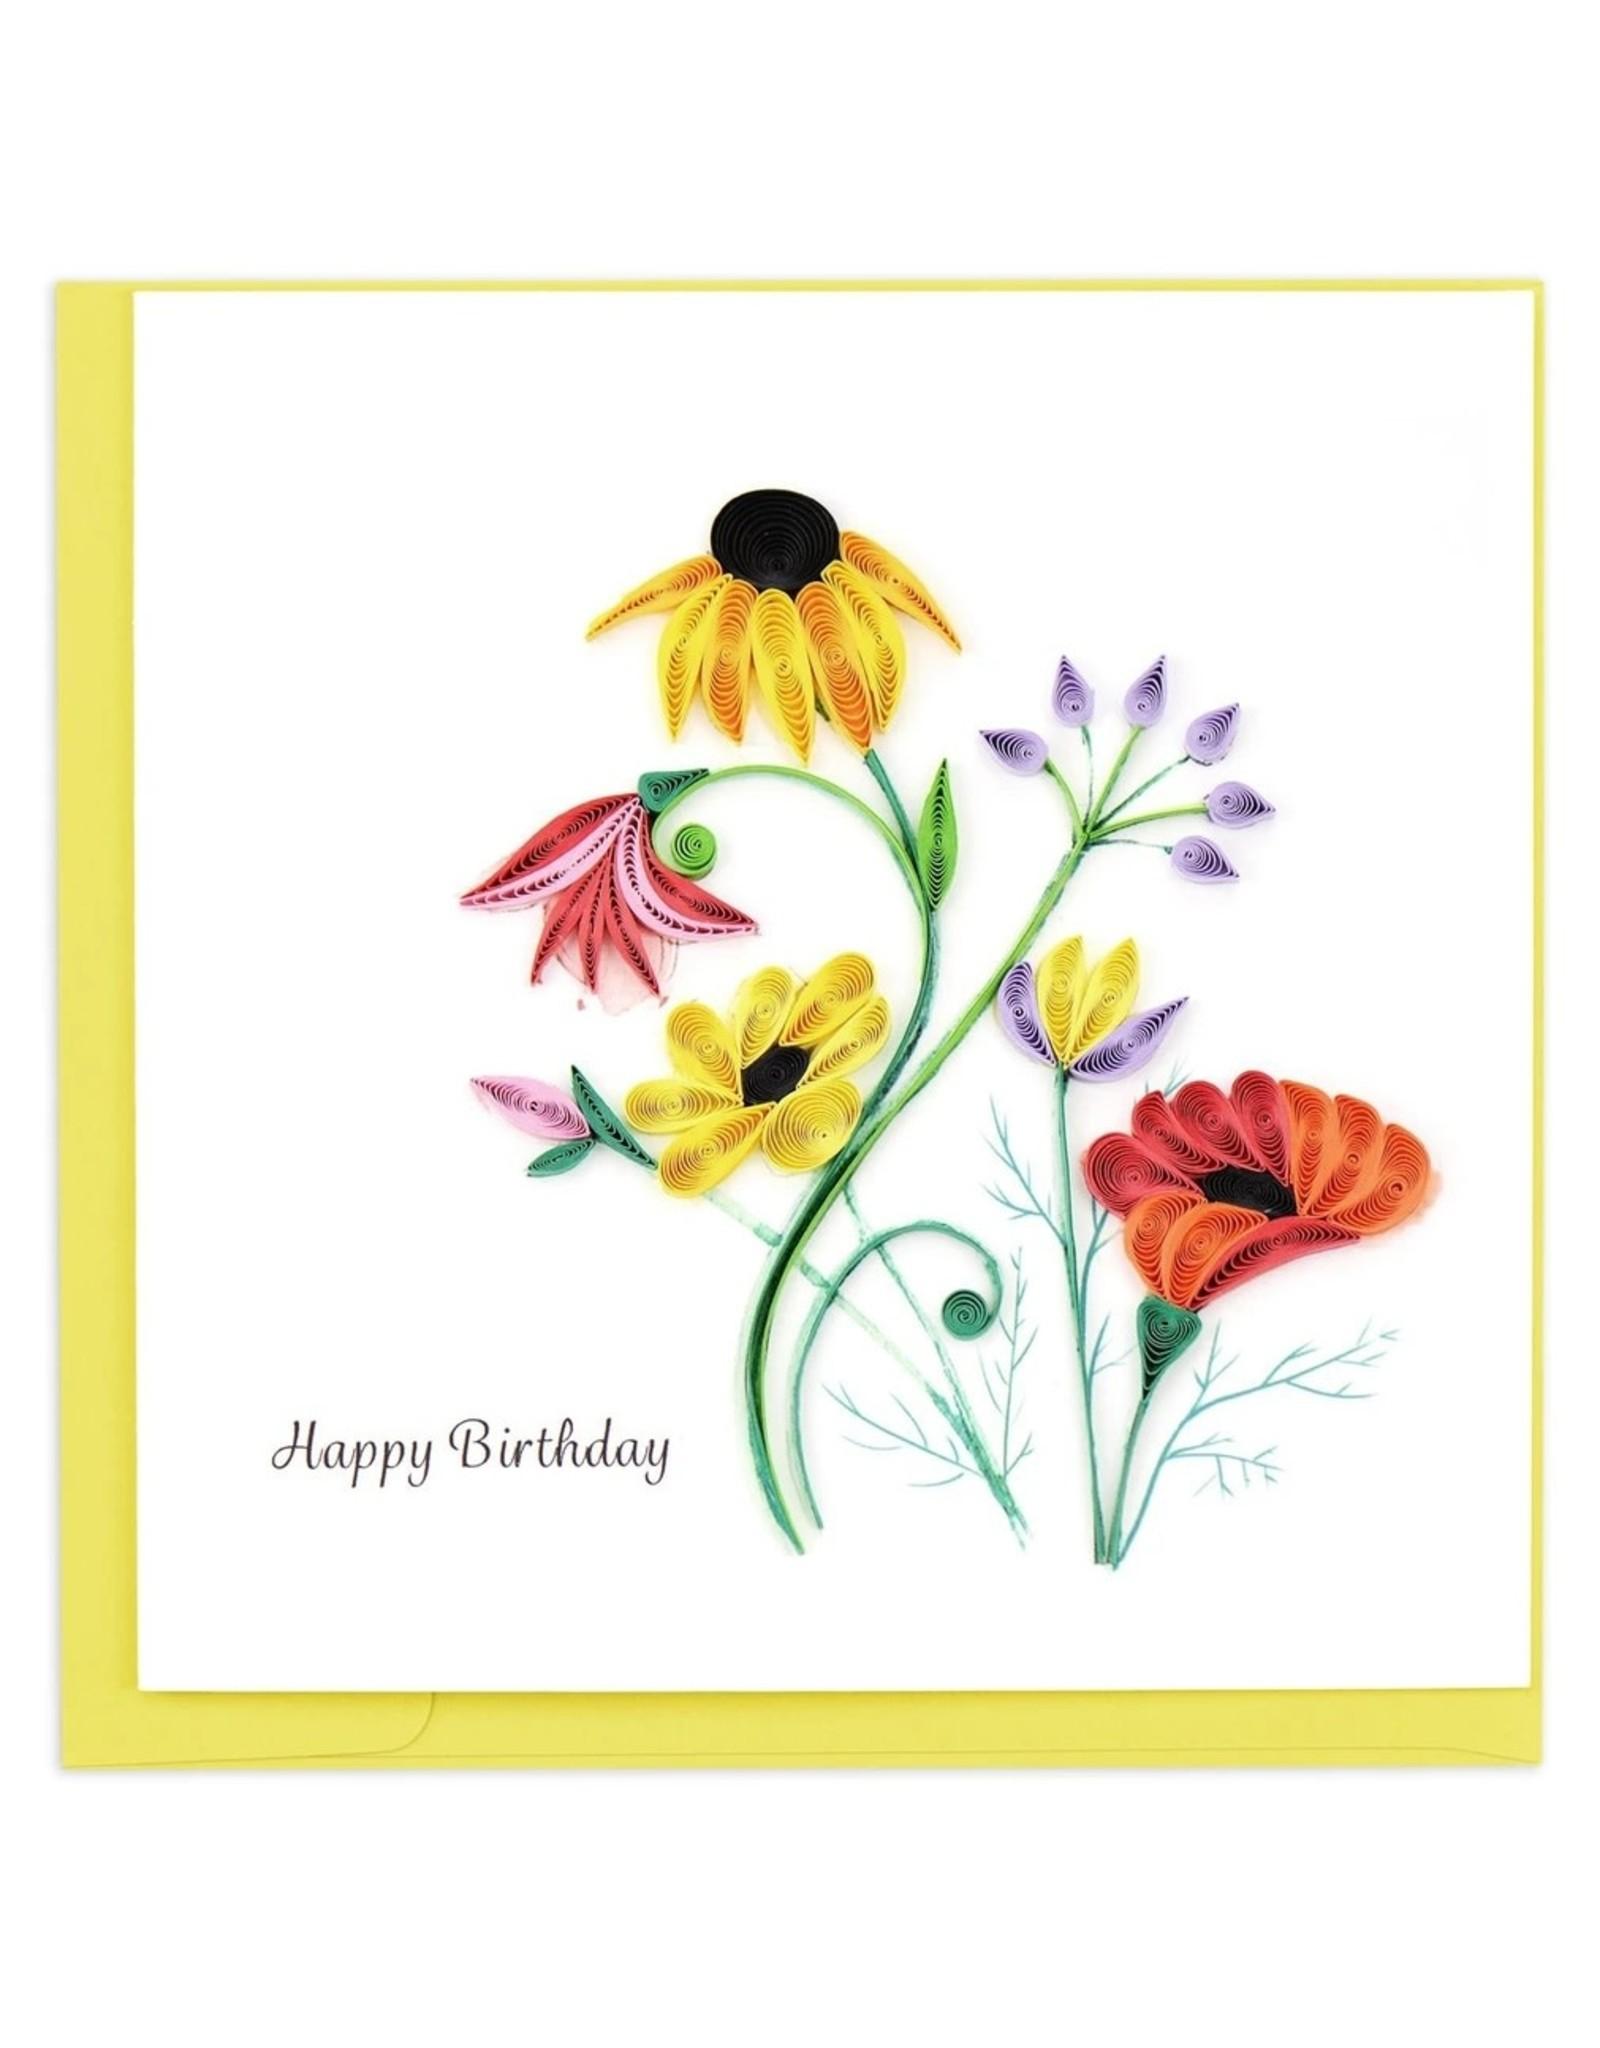 quillingcard Wildflower Birthday Quilled Greeting Card, Vietnam